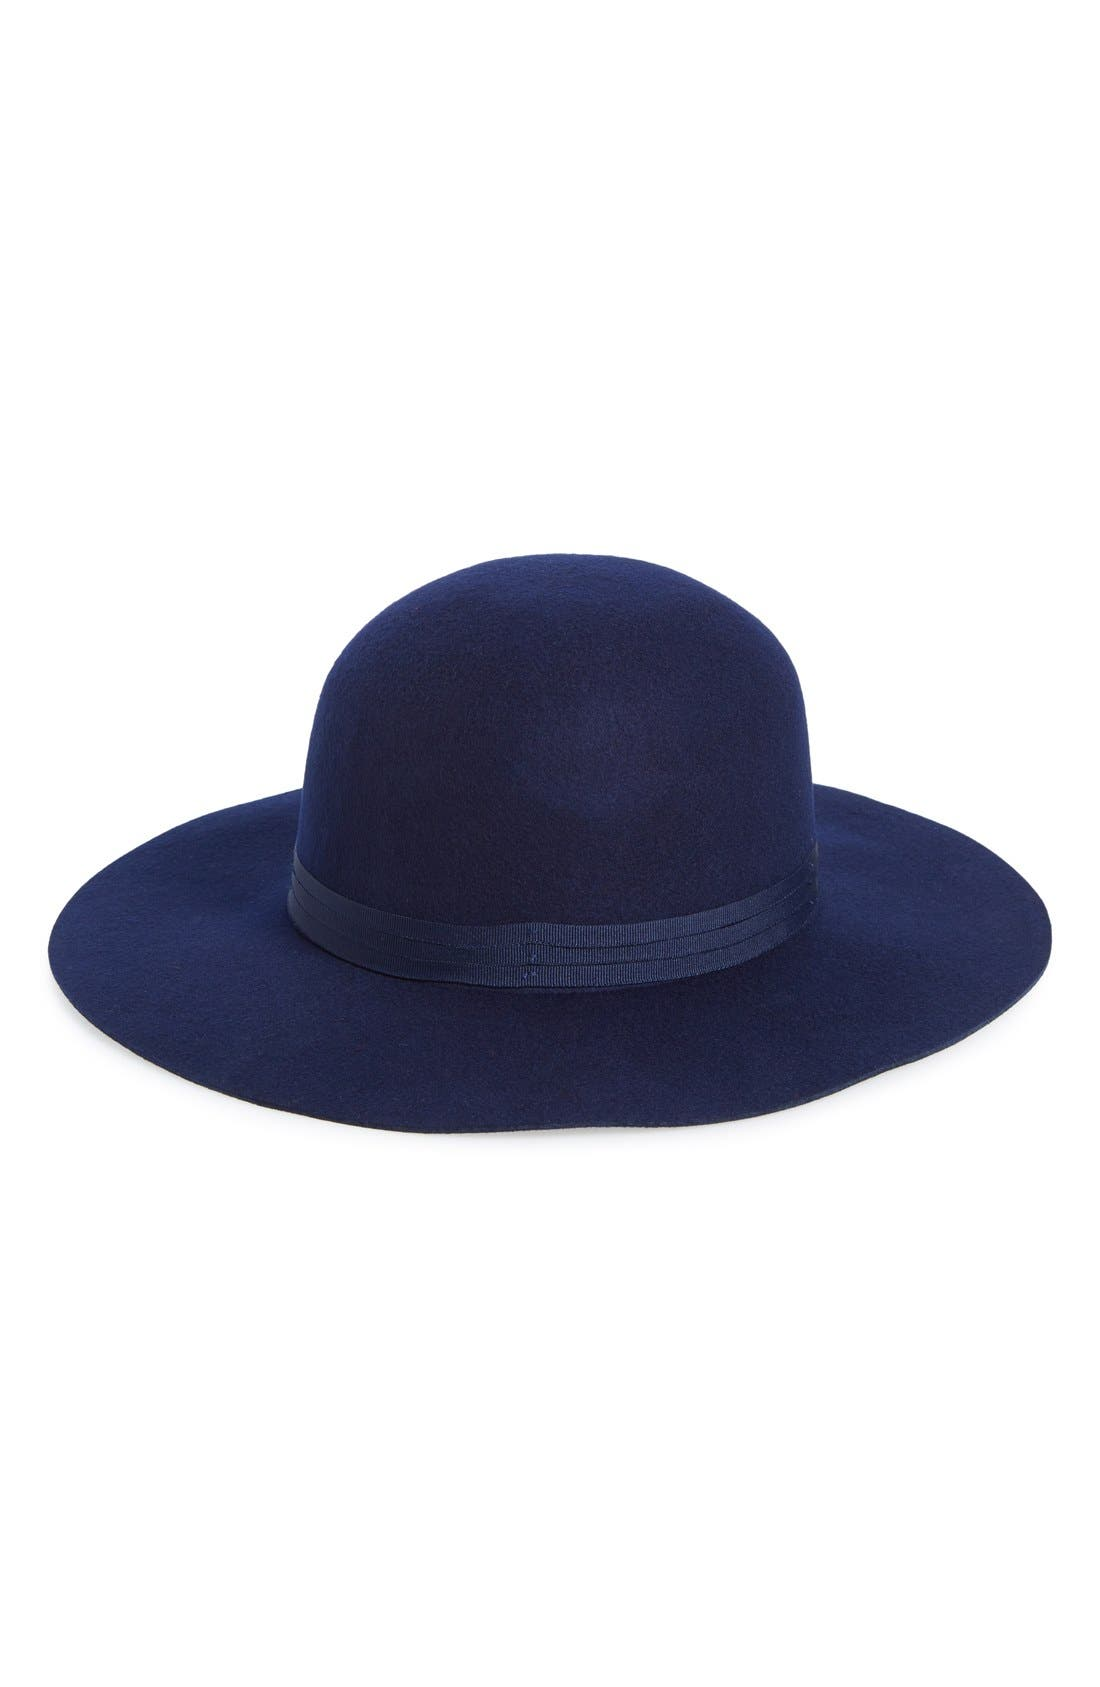 Alternate Image 1 Selected - Brixton'Magdalena' Wide Brim Wool Felt Hat